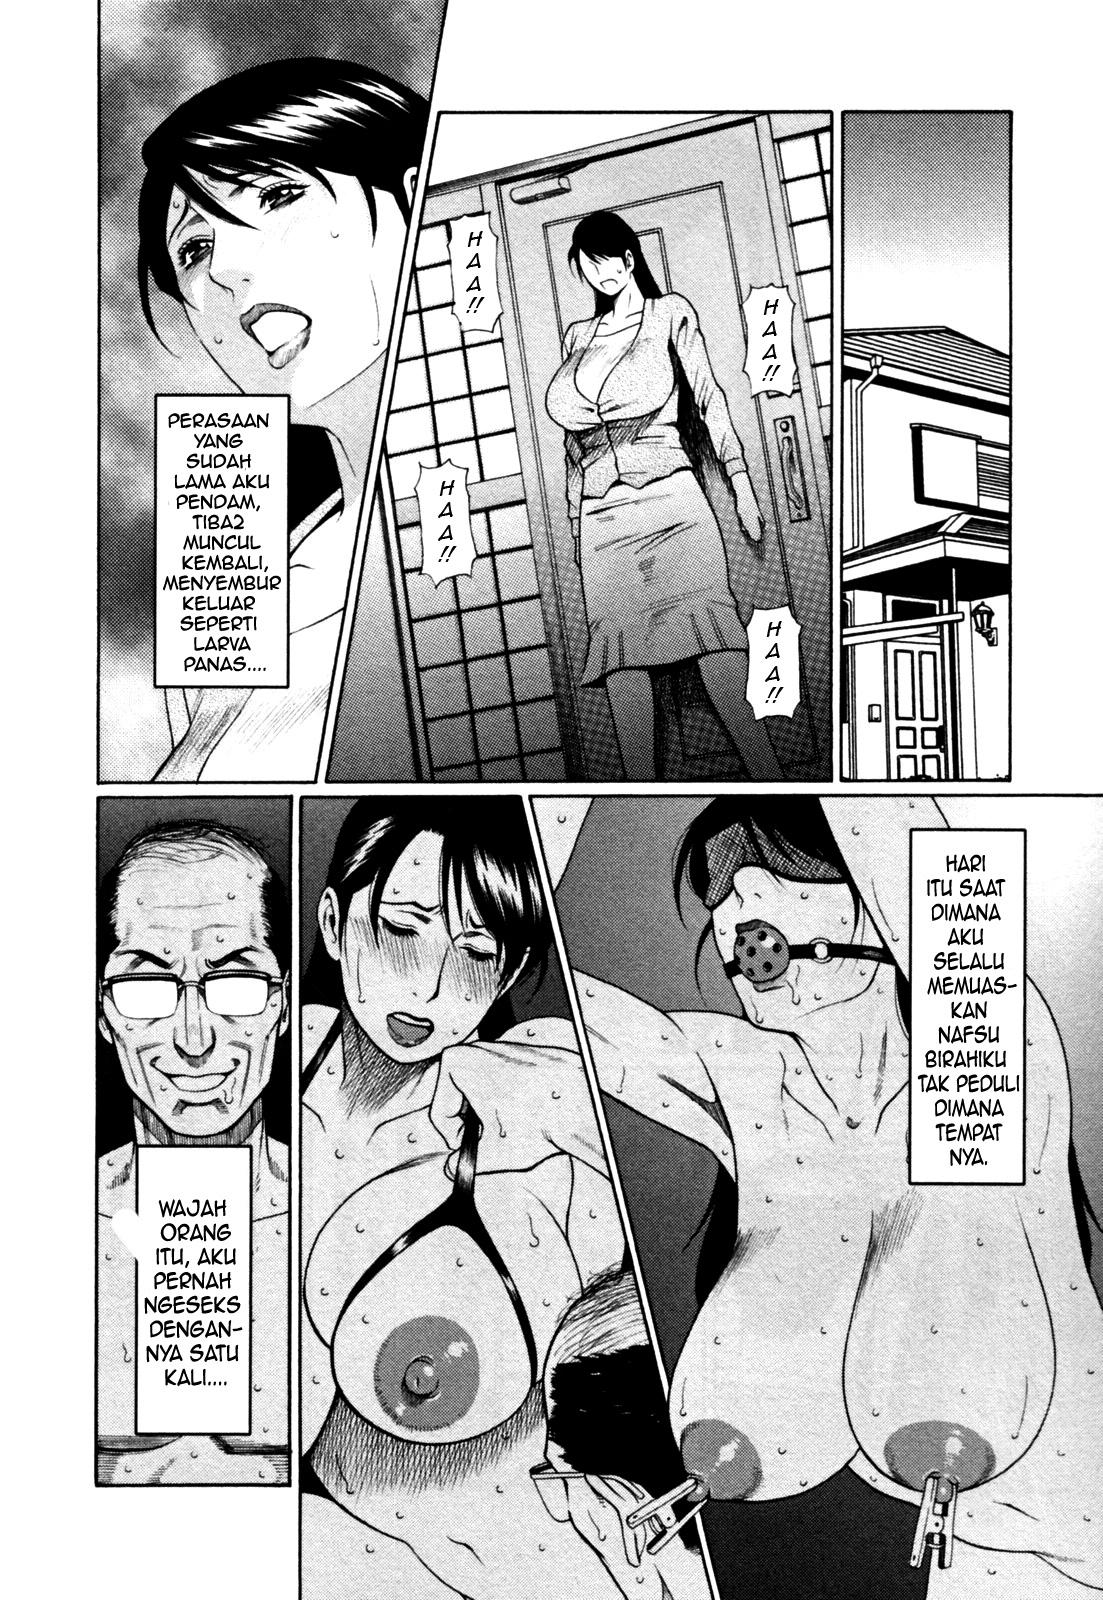 komik bdsm köln stundenhotel